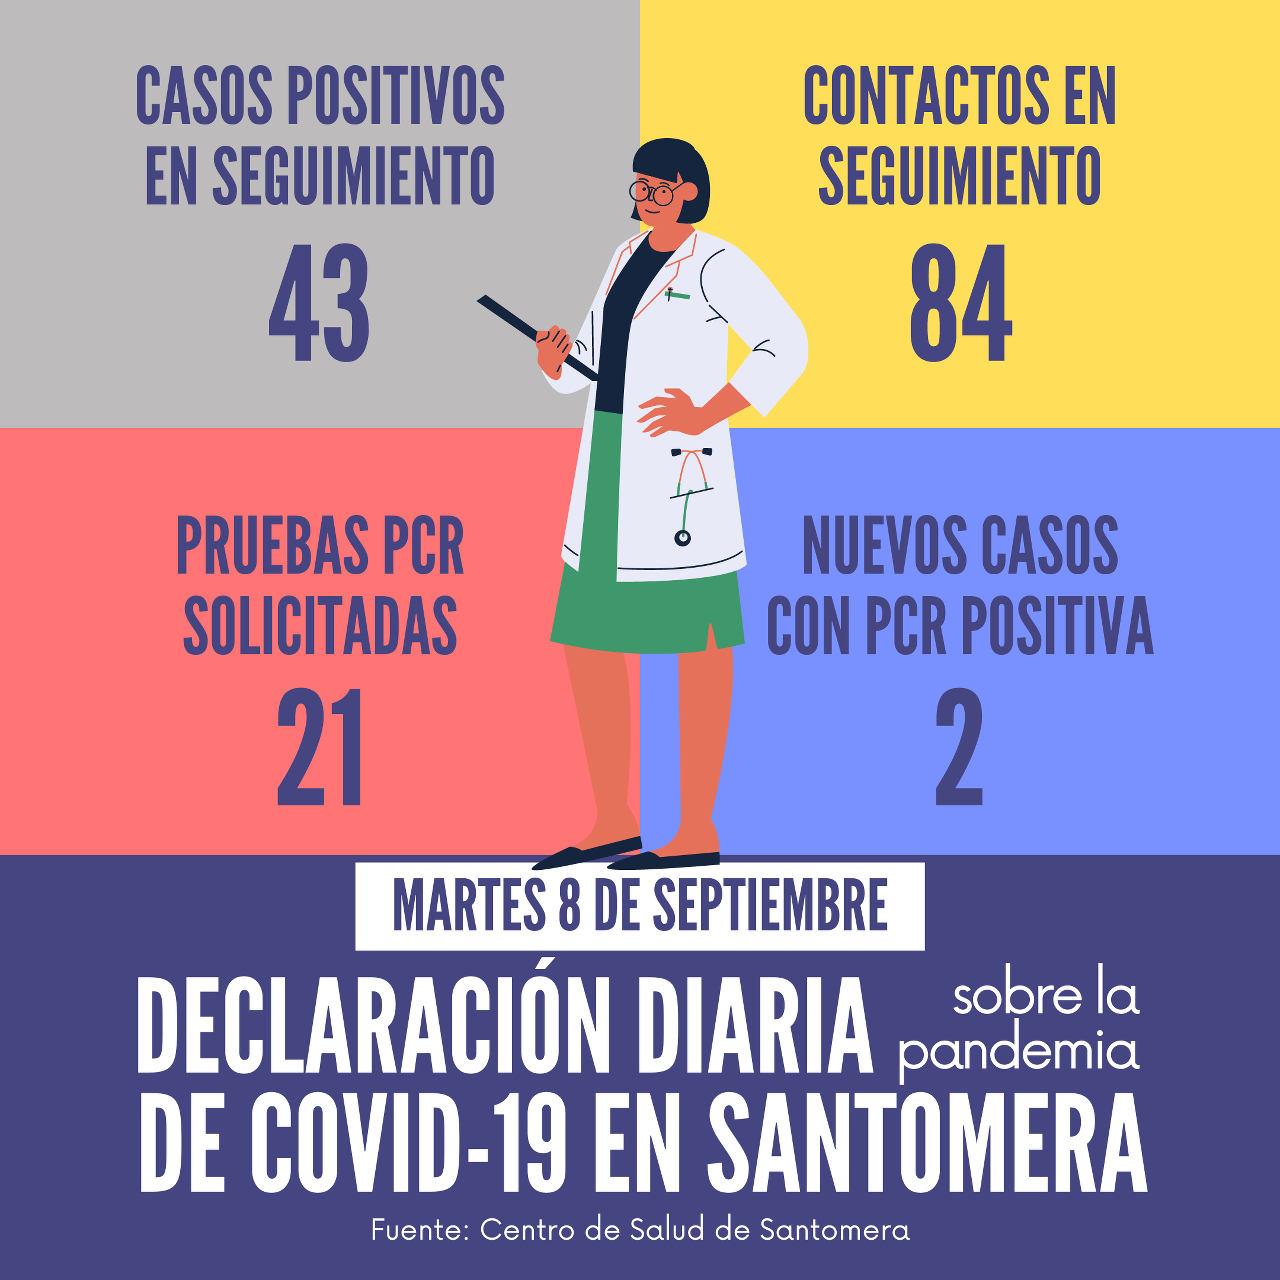 20200908_Datos COVID-19 Santomera